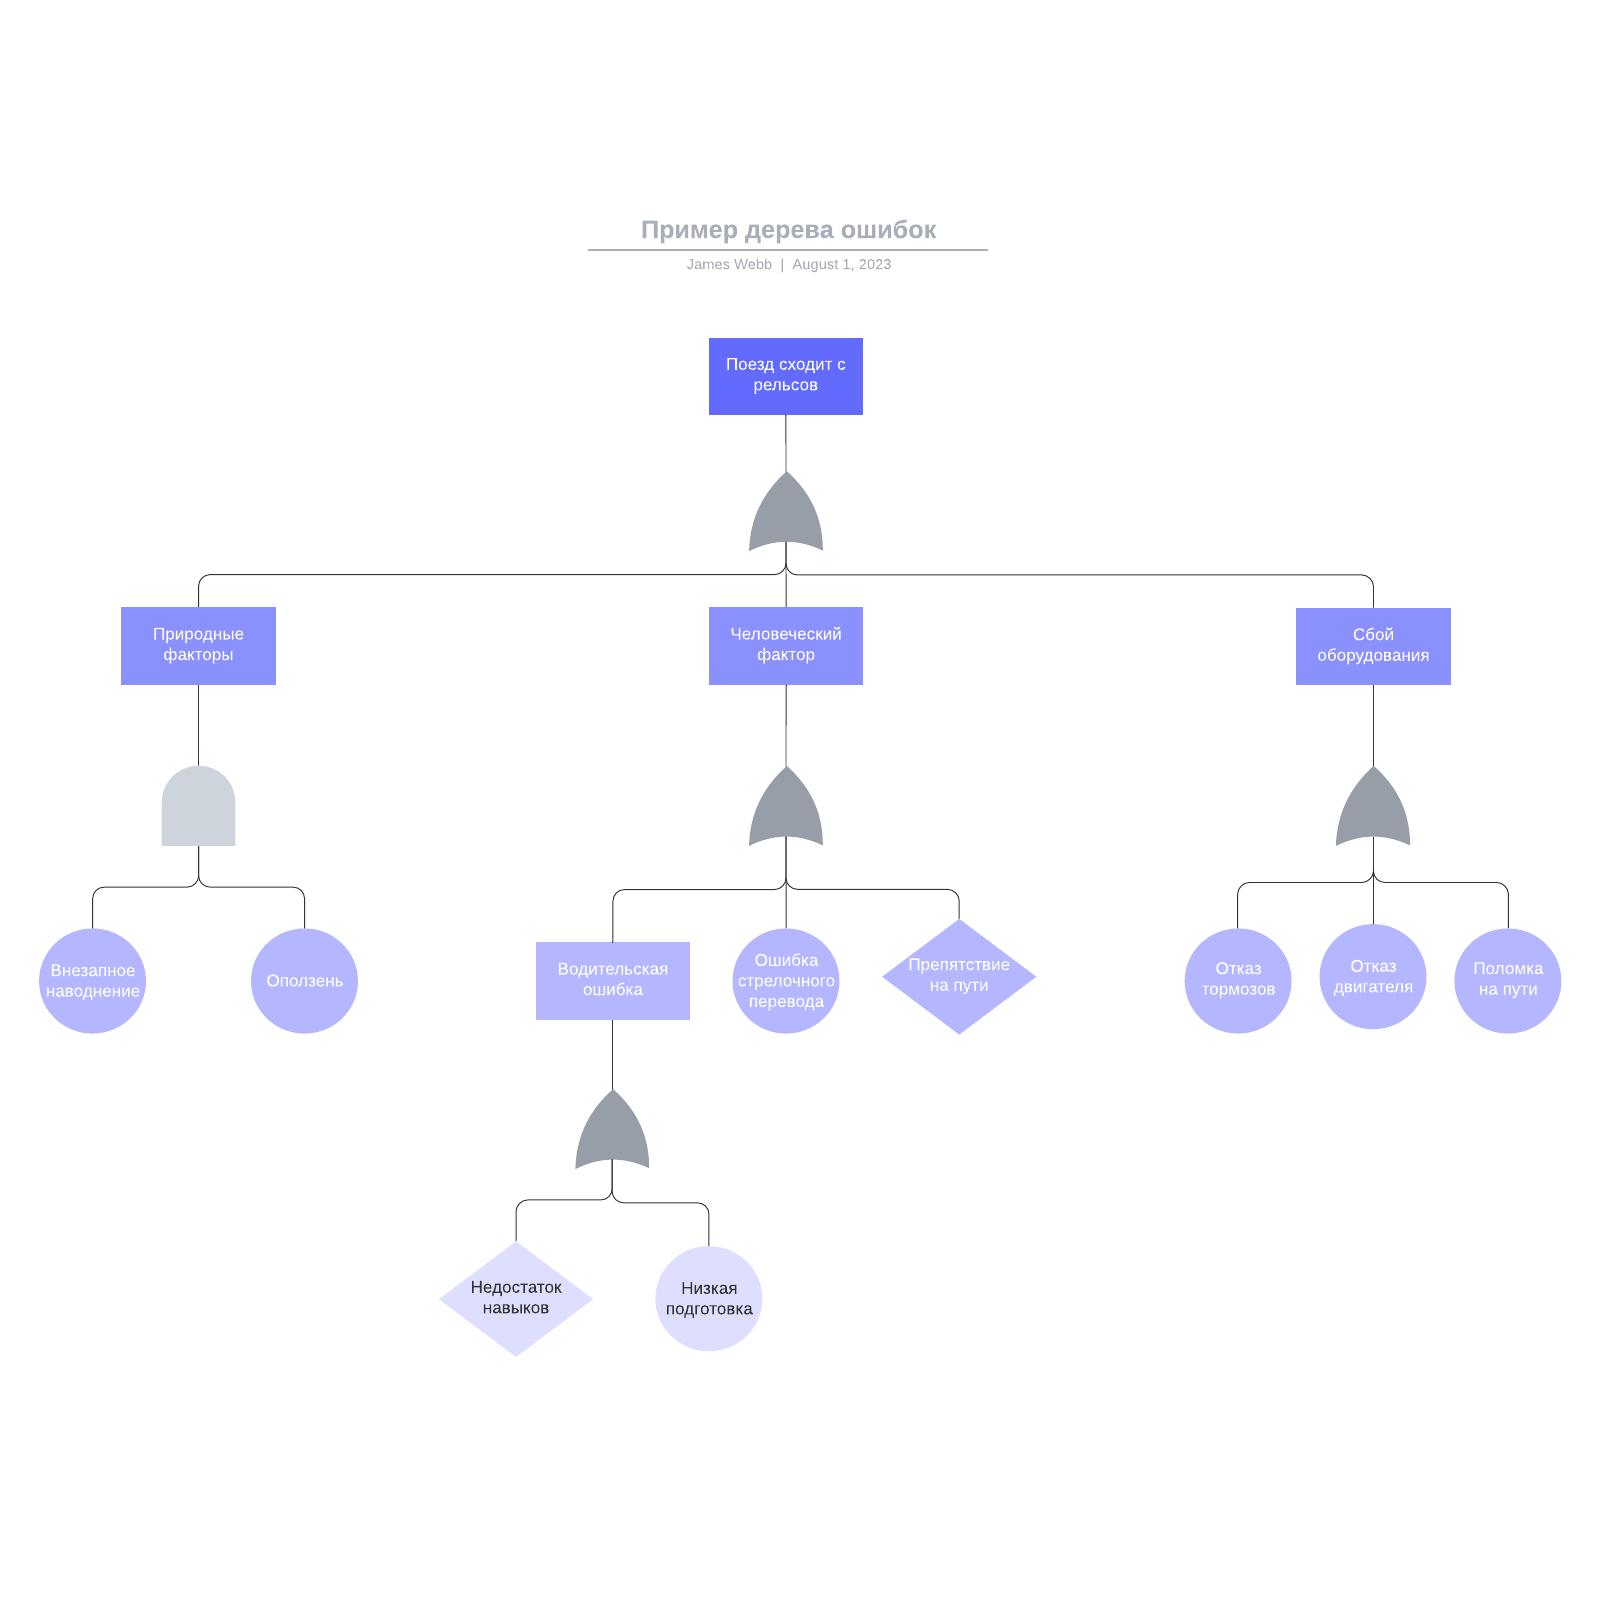 Пример дерева ошибок